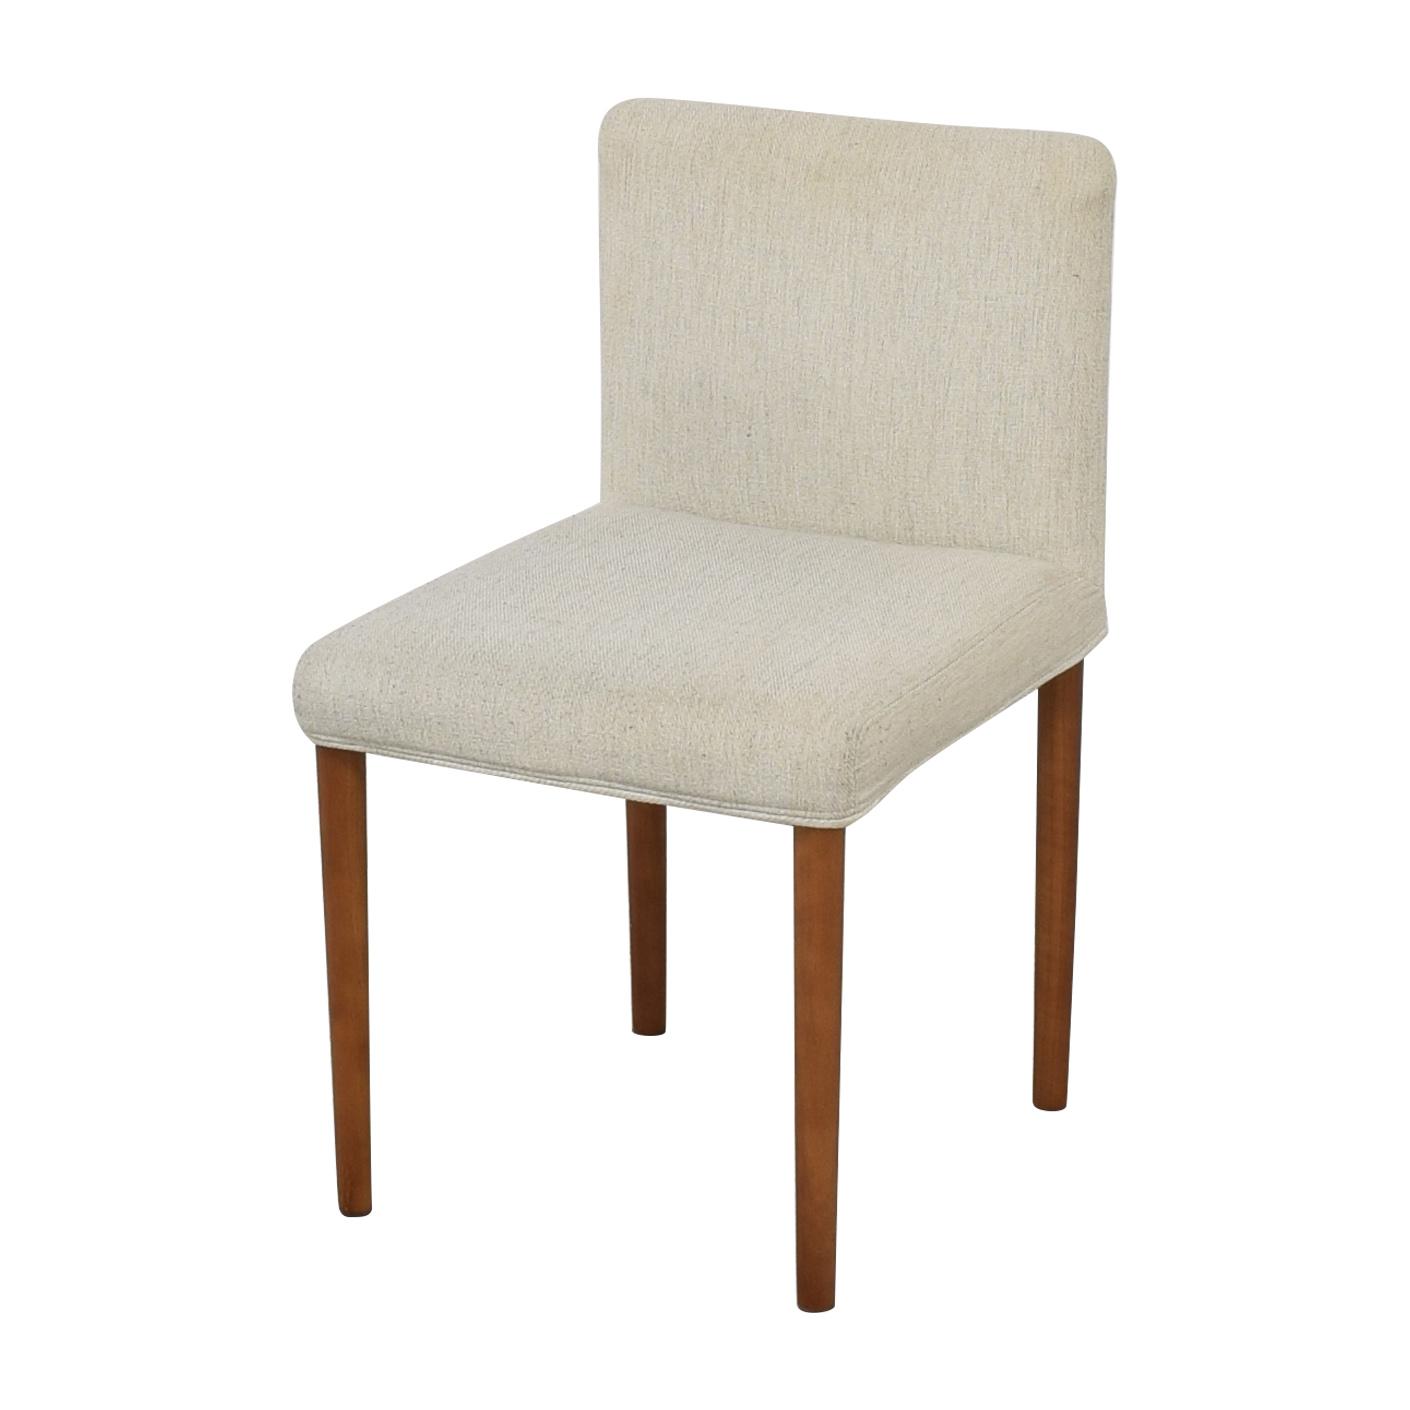 West Elm Ellis Side Dining Chairs sale